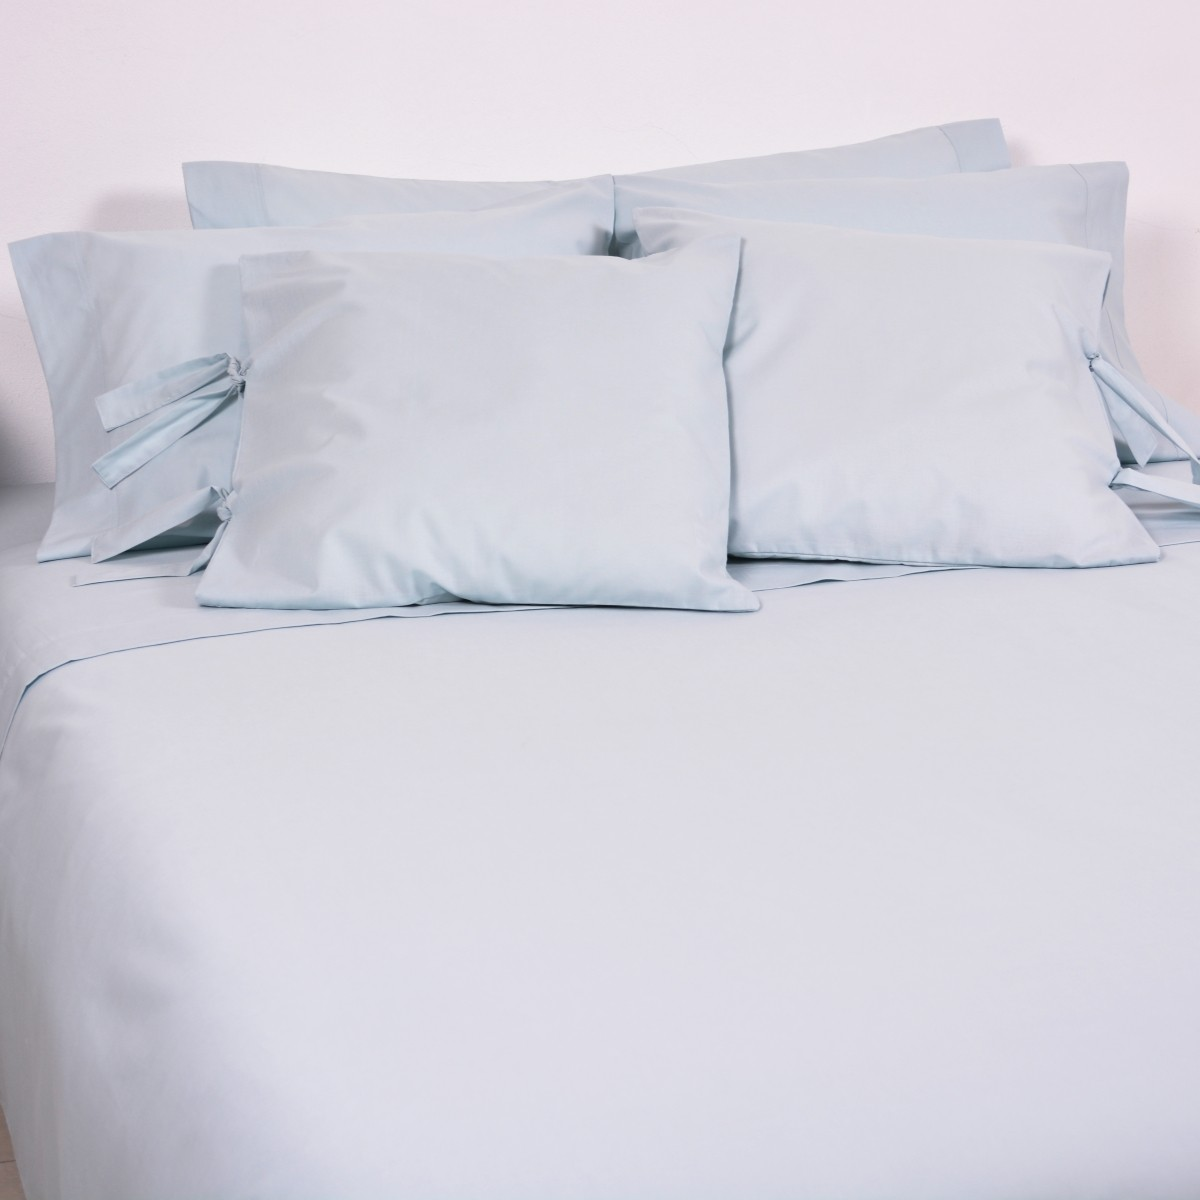 Fitted Sheet NUDE Cotton, LAMEIRINHO